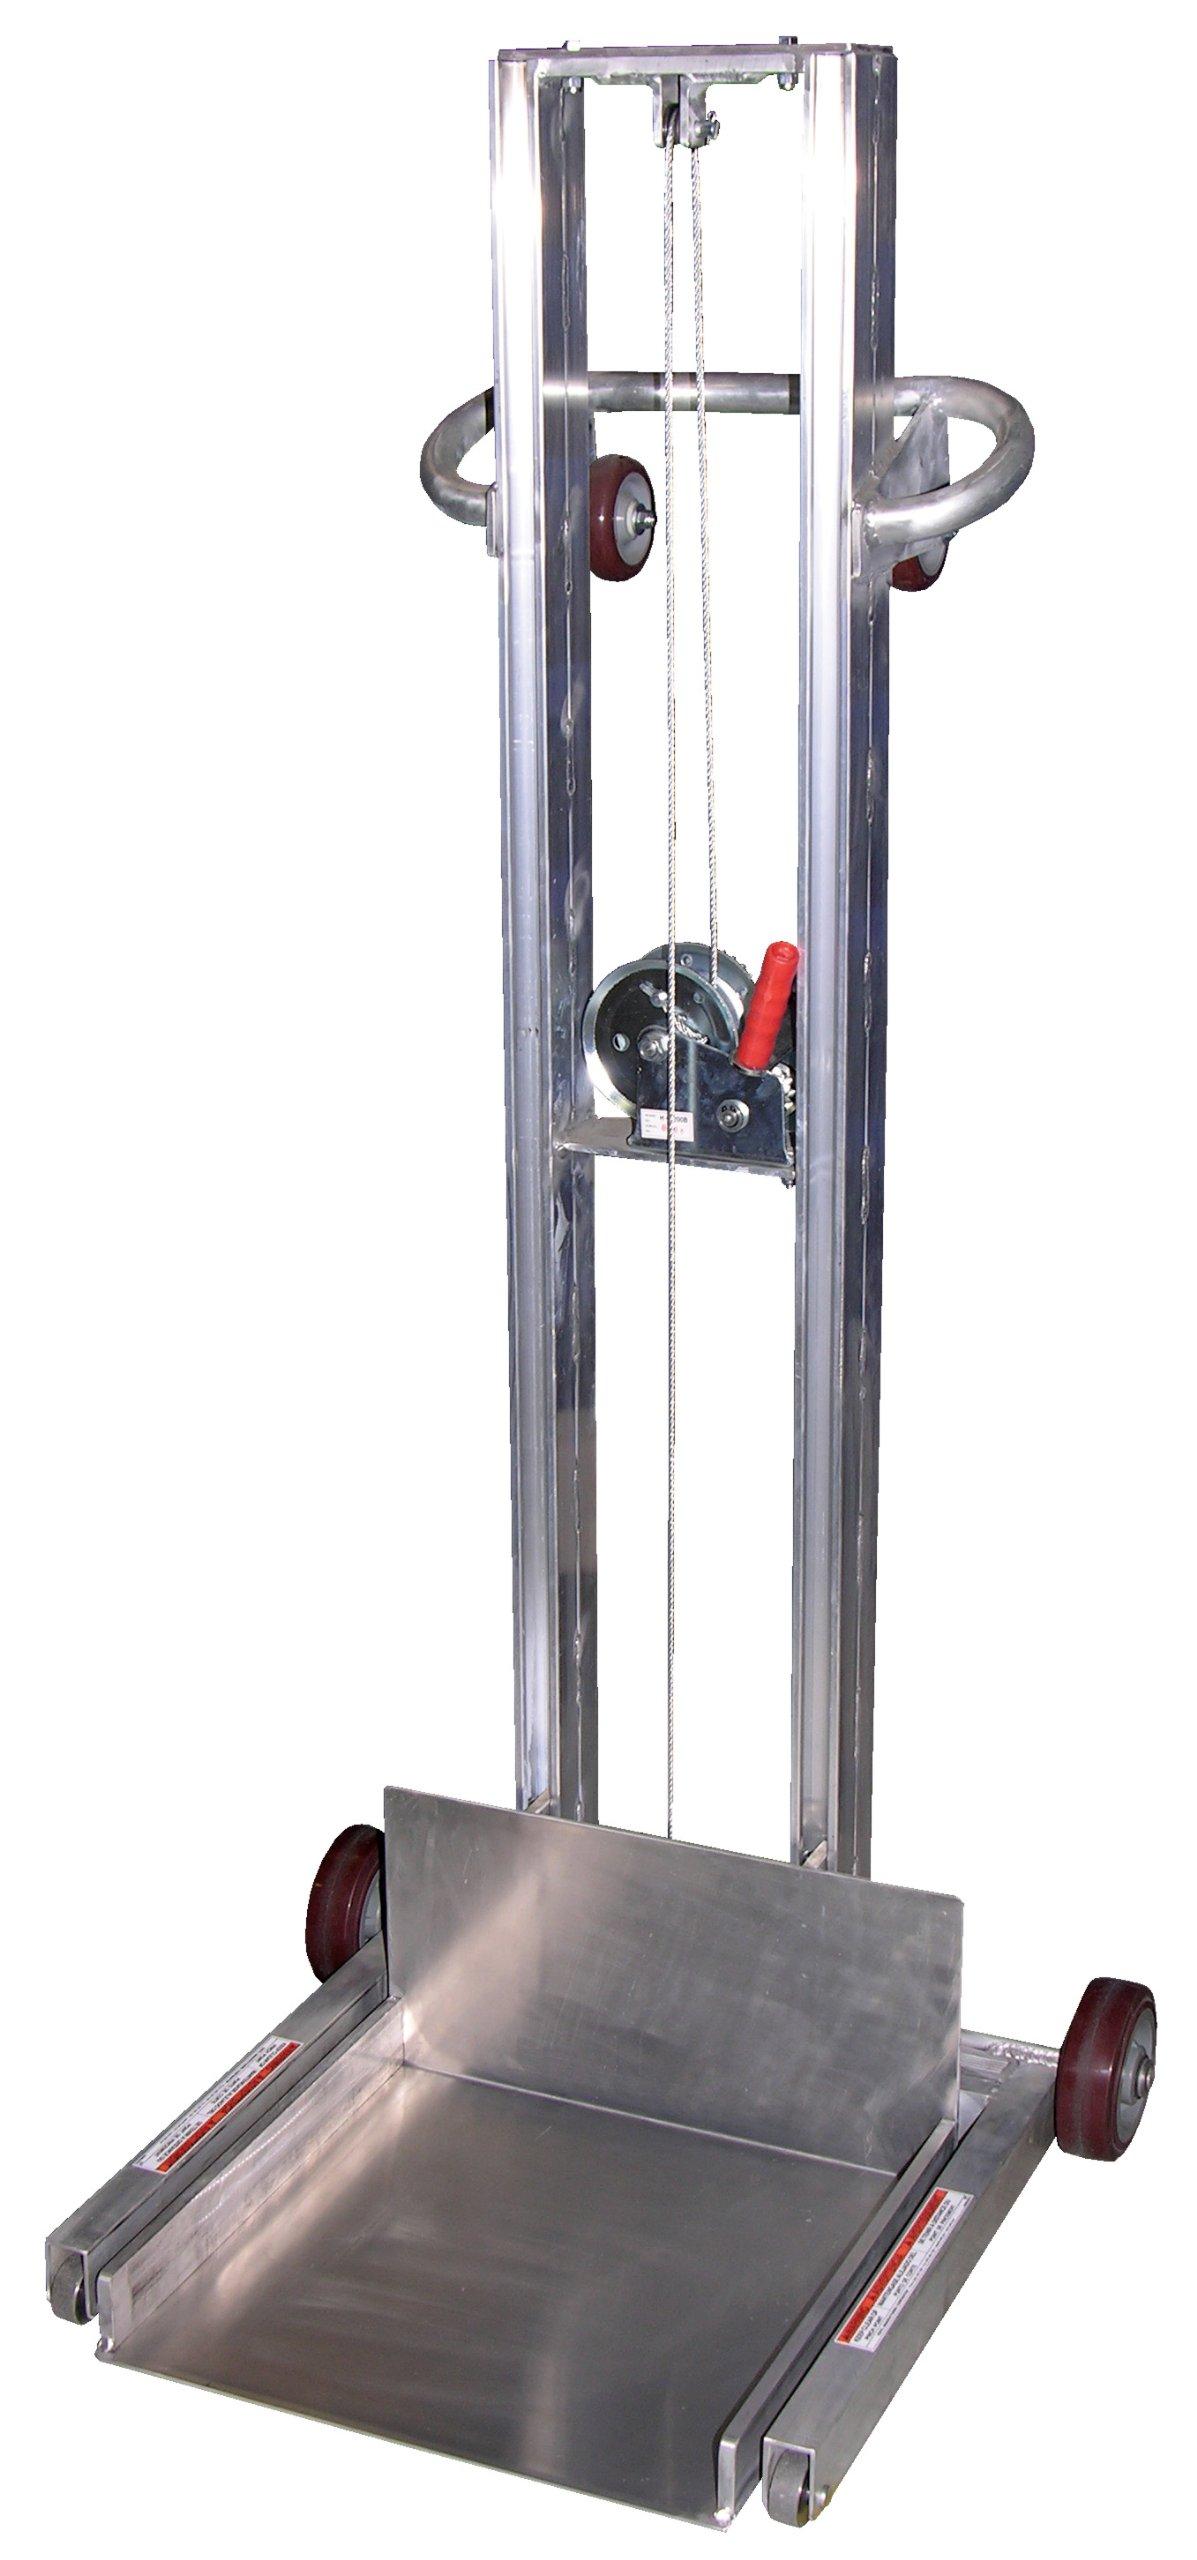 Vestil ALLPW-500-FW Aluminum Low Profile Lite Load Lift Winch, 400 lbs Capacity, 20'' Length x 20'' Width Platform, 1/4'' - 55'' Height Range